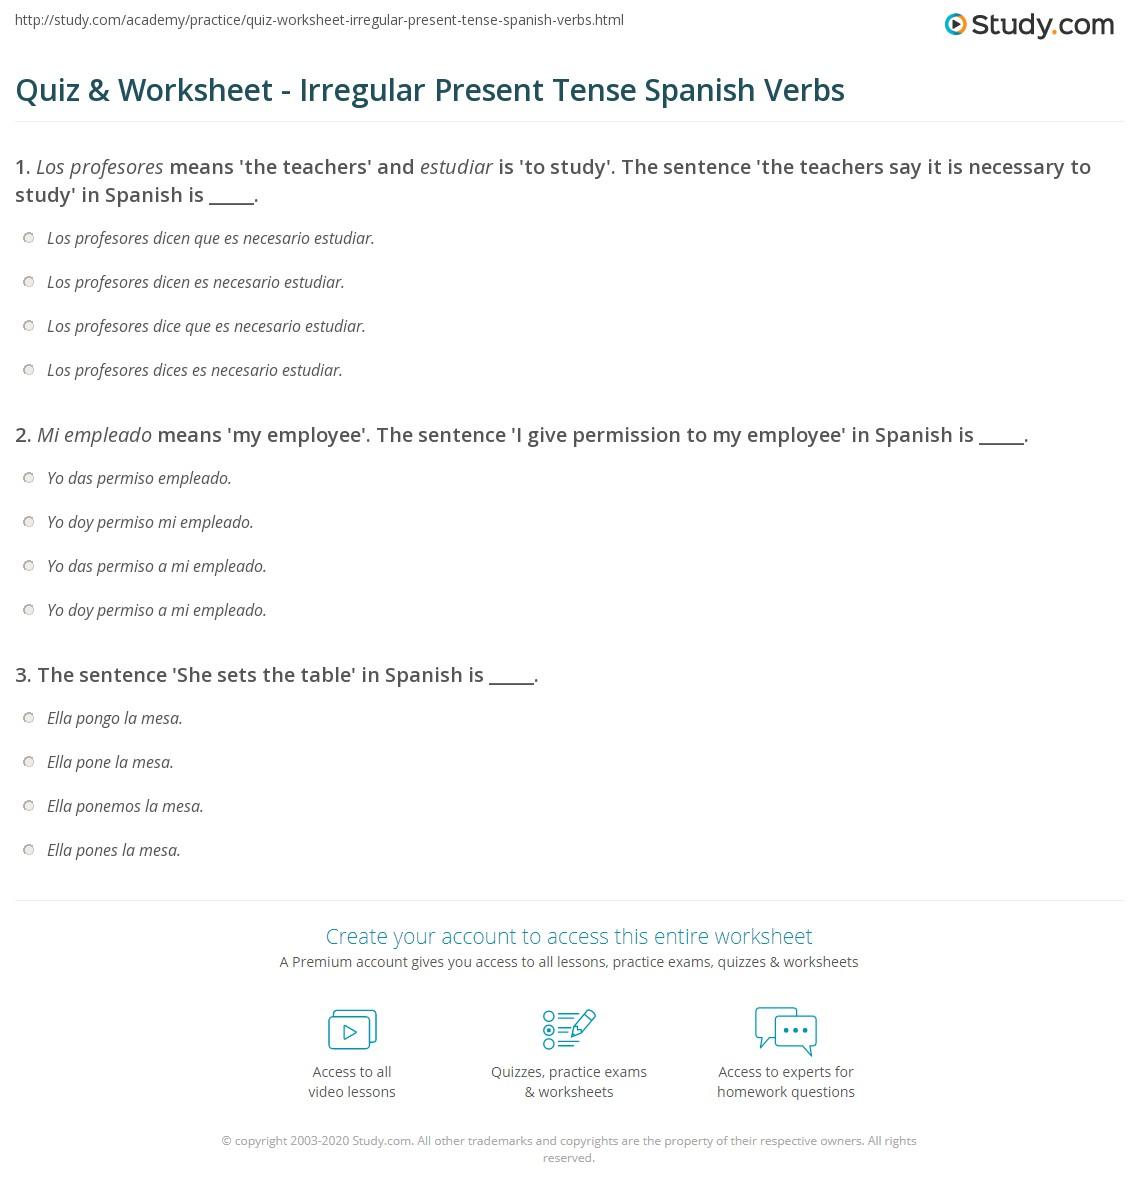 Quiz & Worksheet - Irregular Present Tense Spanish Verbs | Study.com